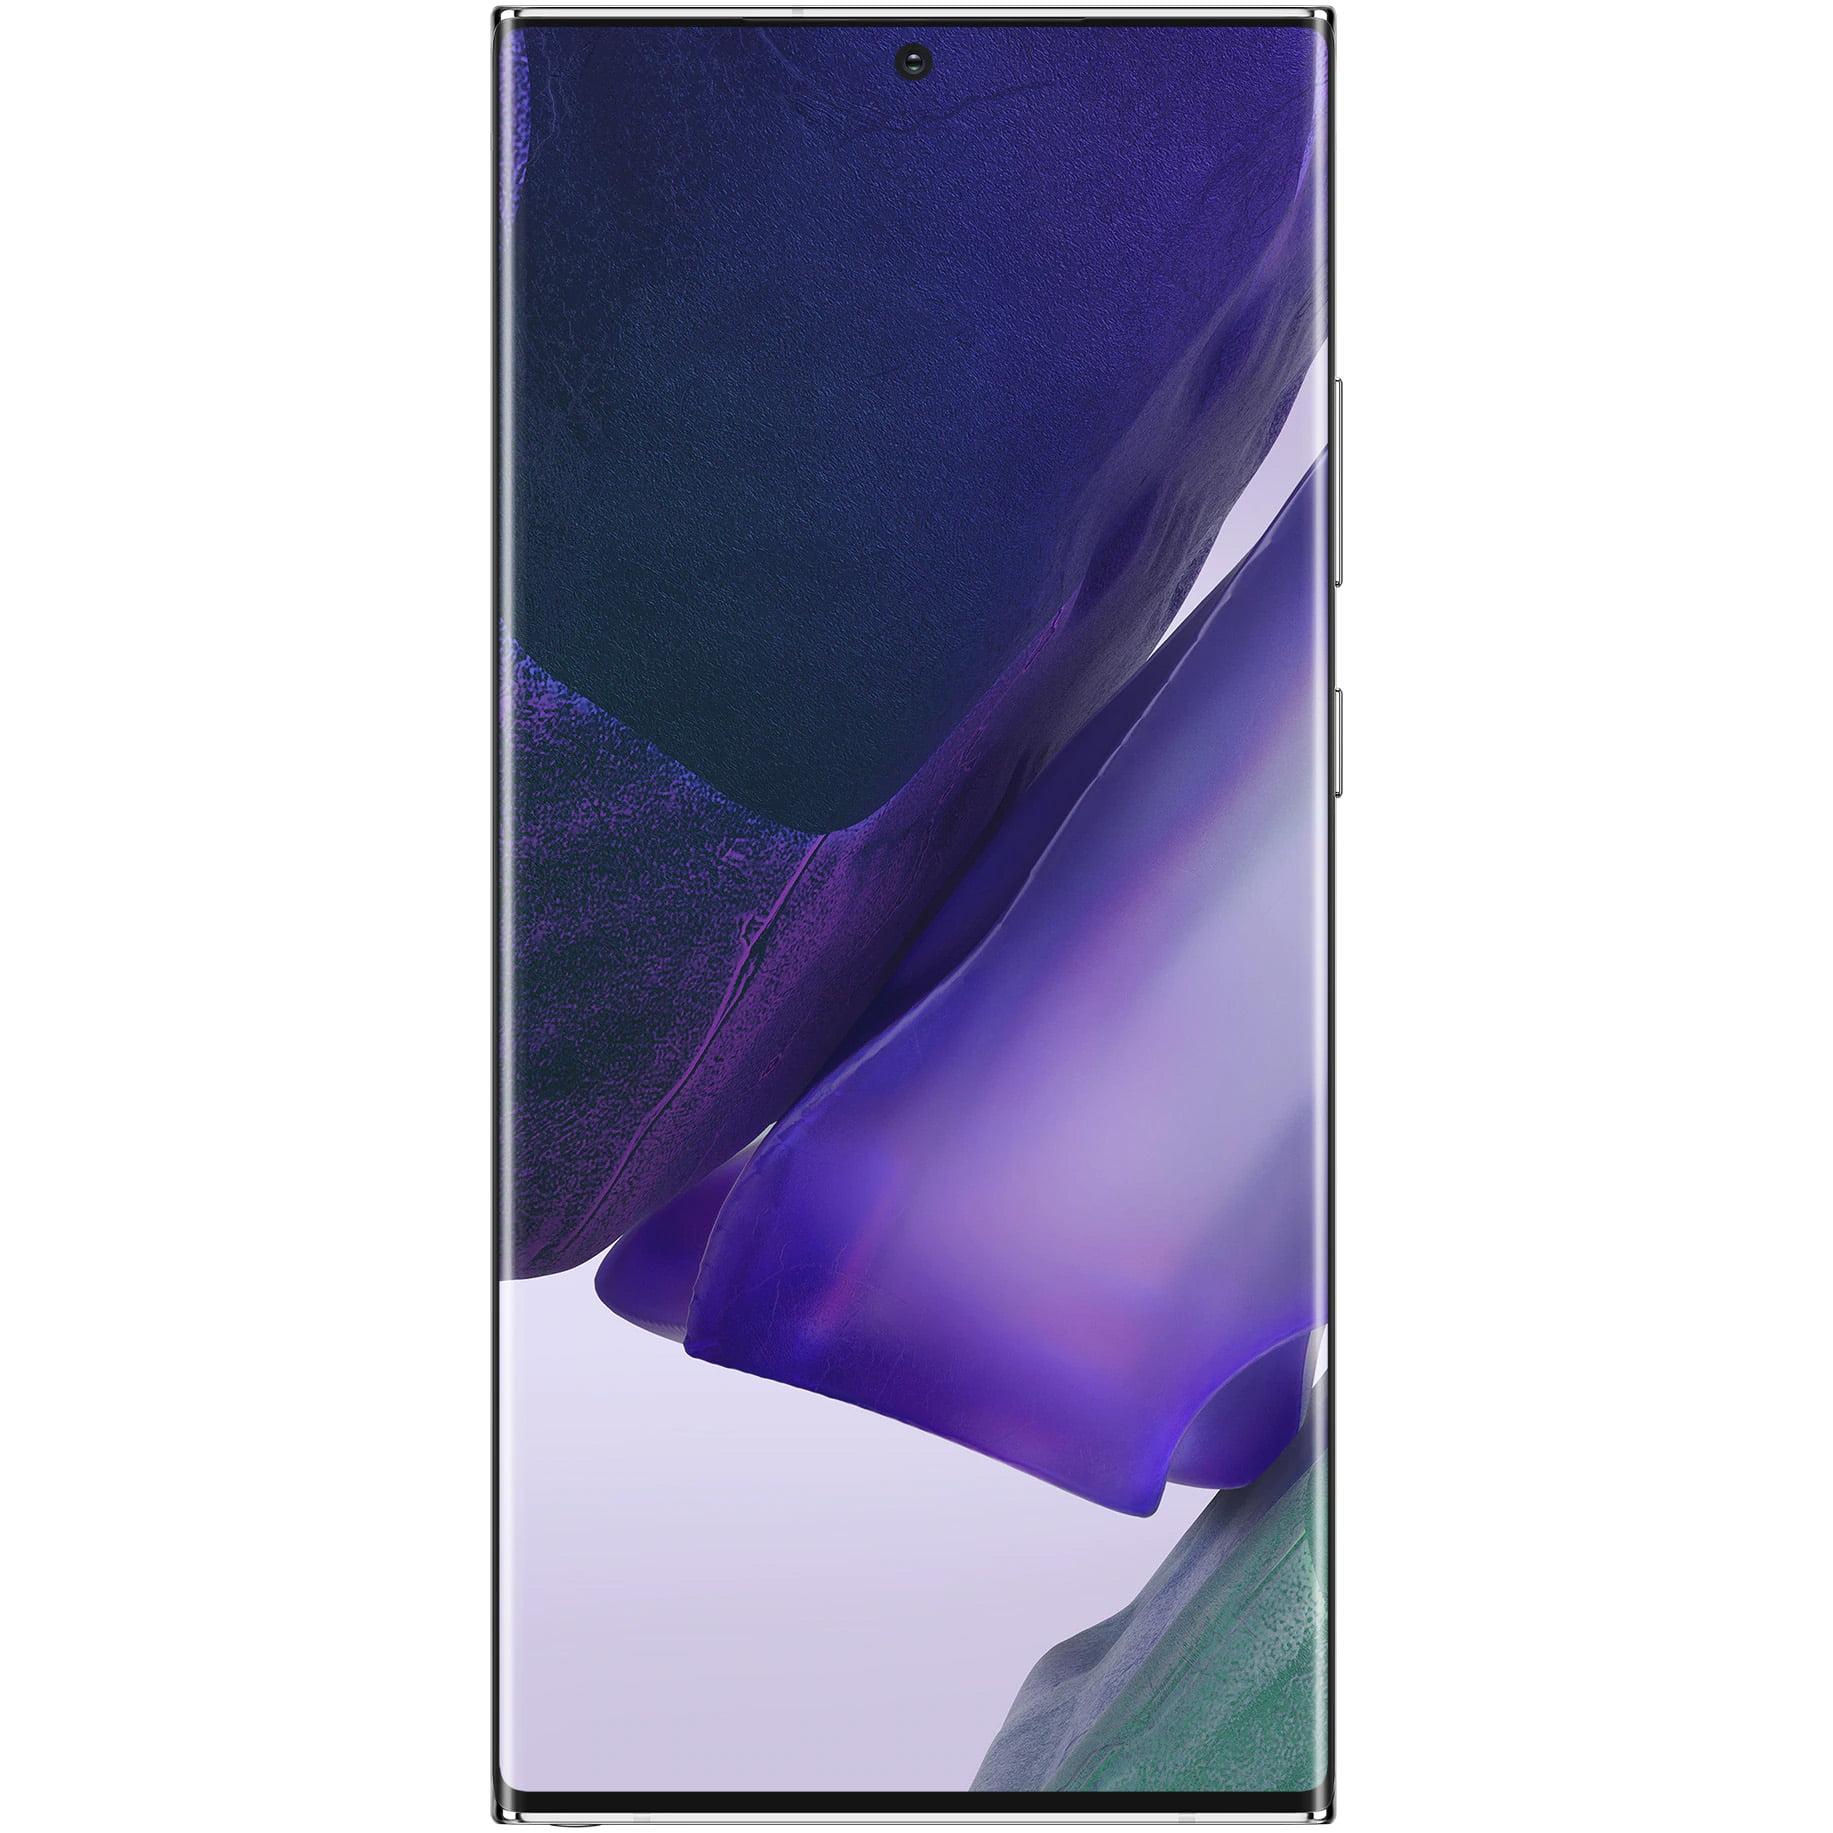 Telefon mobil Samsung Galaxy Note 20 Ultra, Dual SIM, 256GB, 12GB RAM, 5G, Mystic White